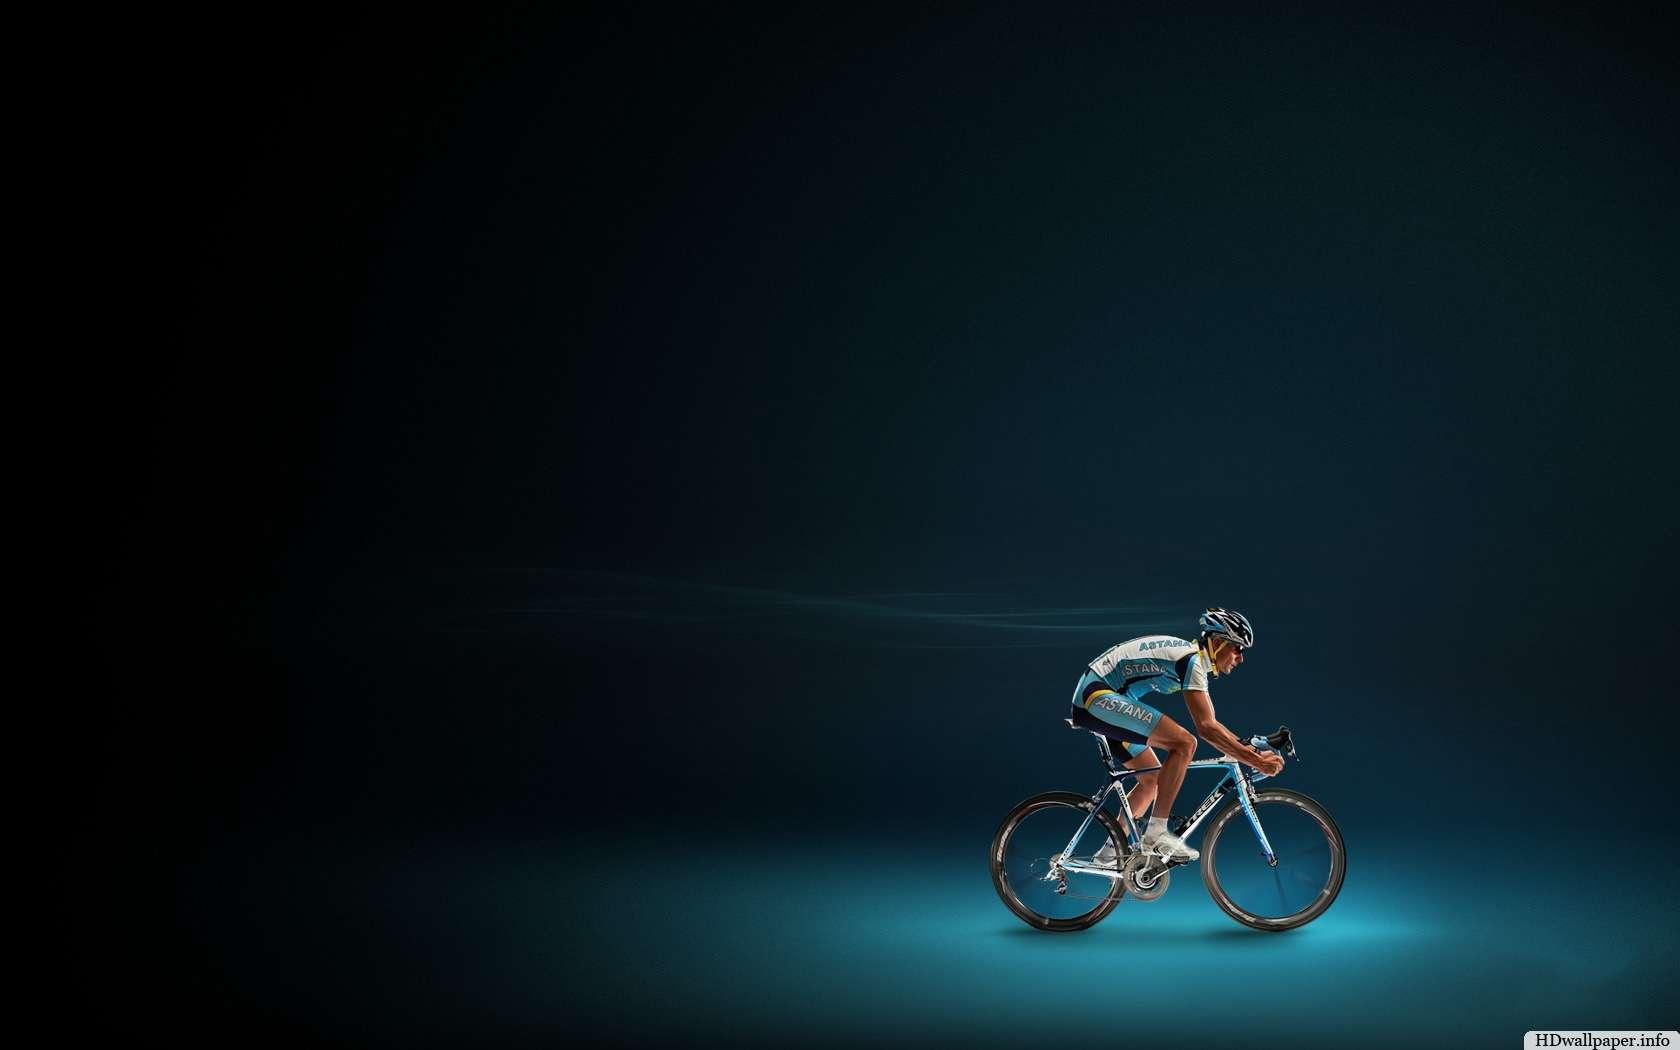 Latest Sports Cool HD Desktop Wallpaper HD Wallpapers 1680x1050